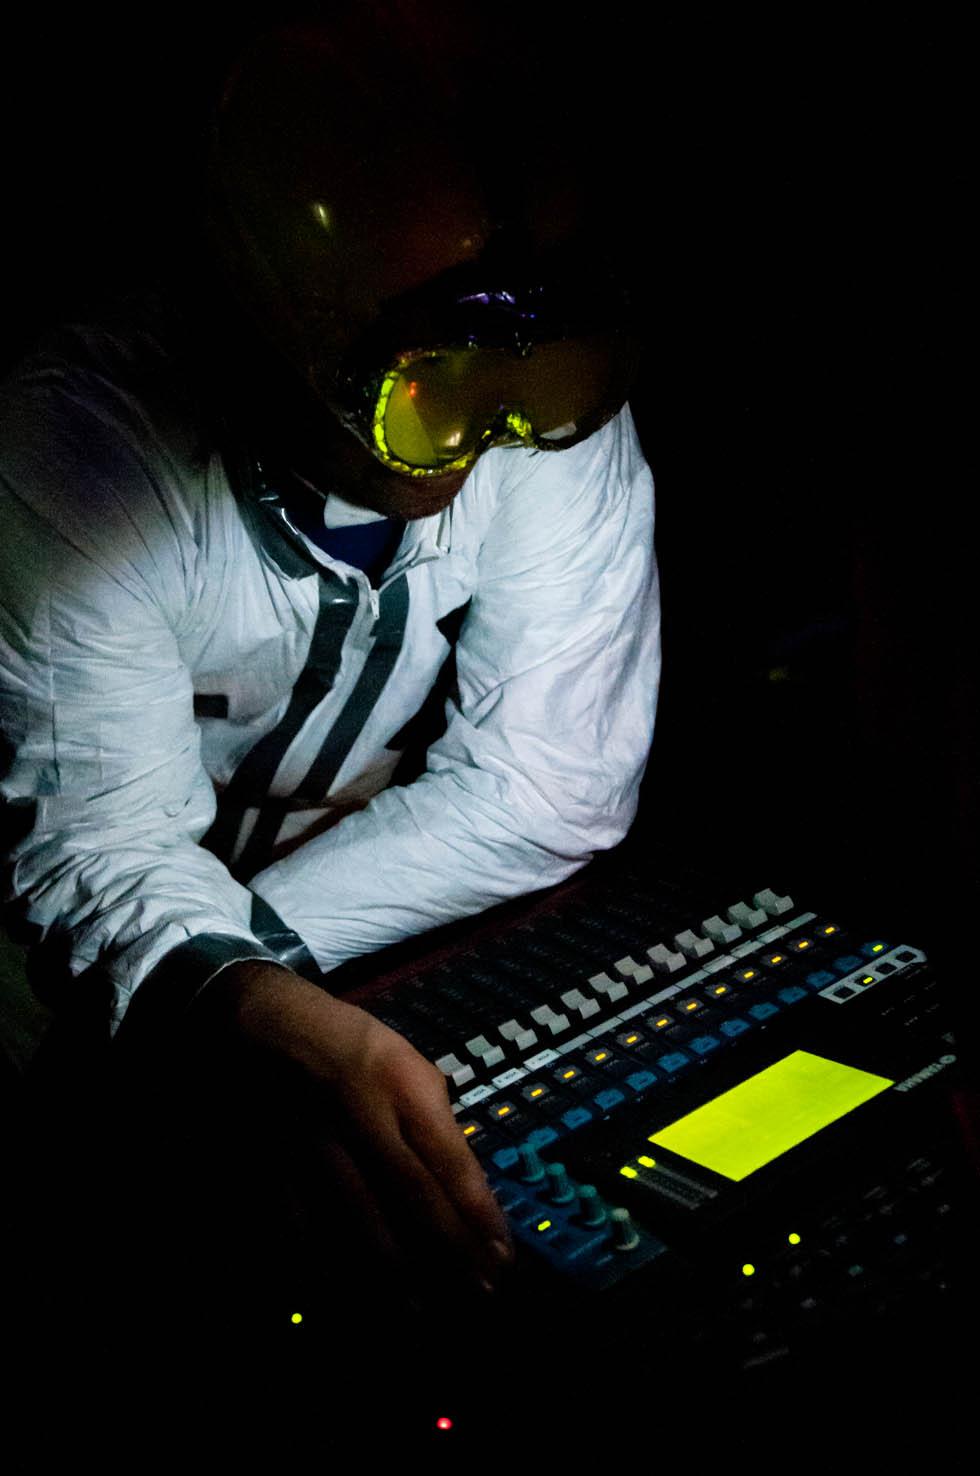 zum-schneider-nyc-2012-karneval-apocalyptika-3504.jpg